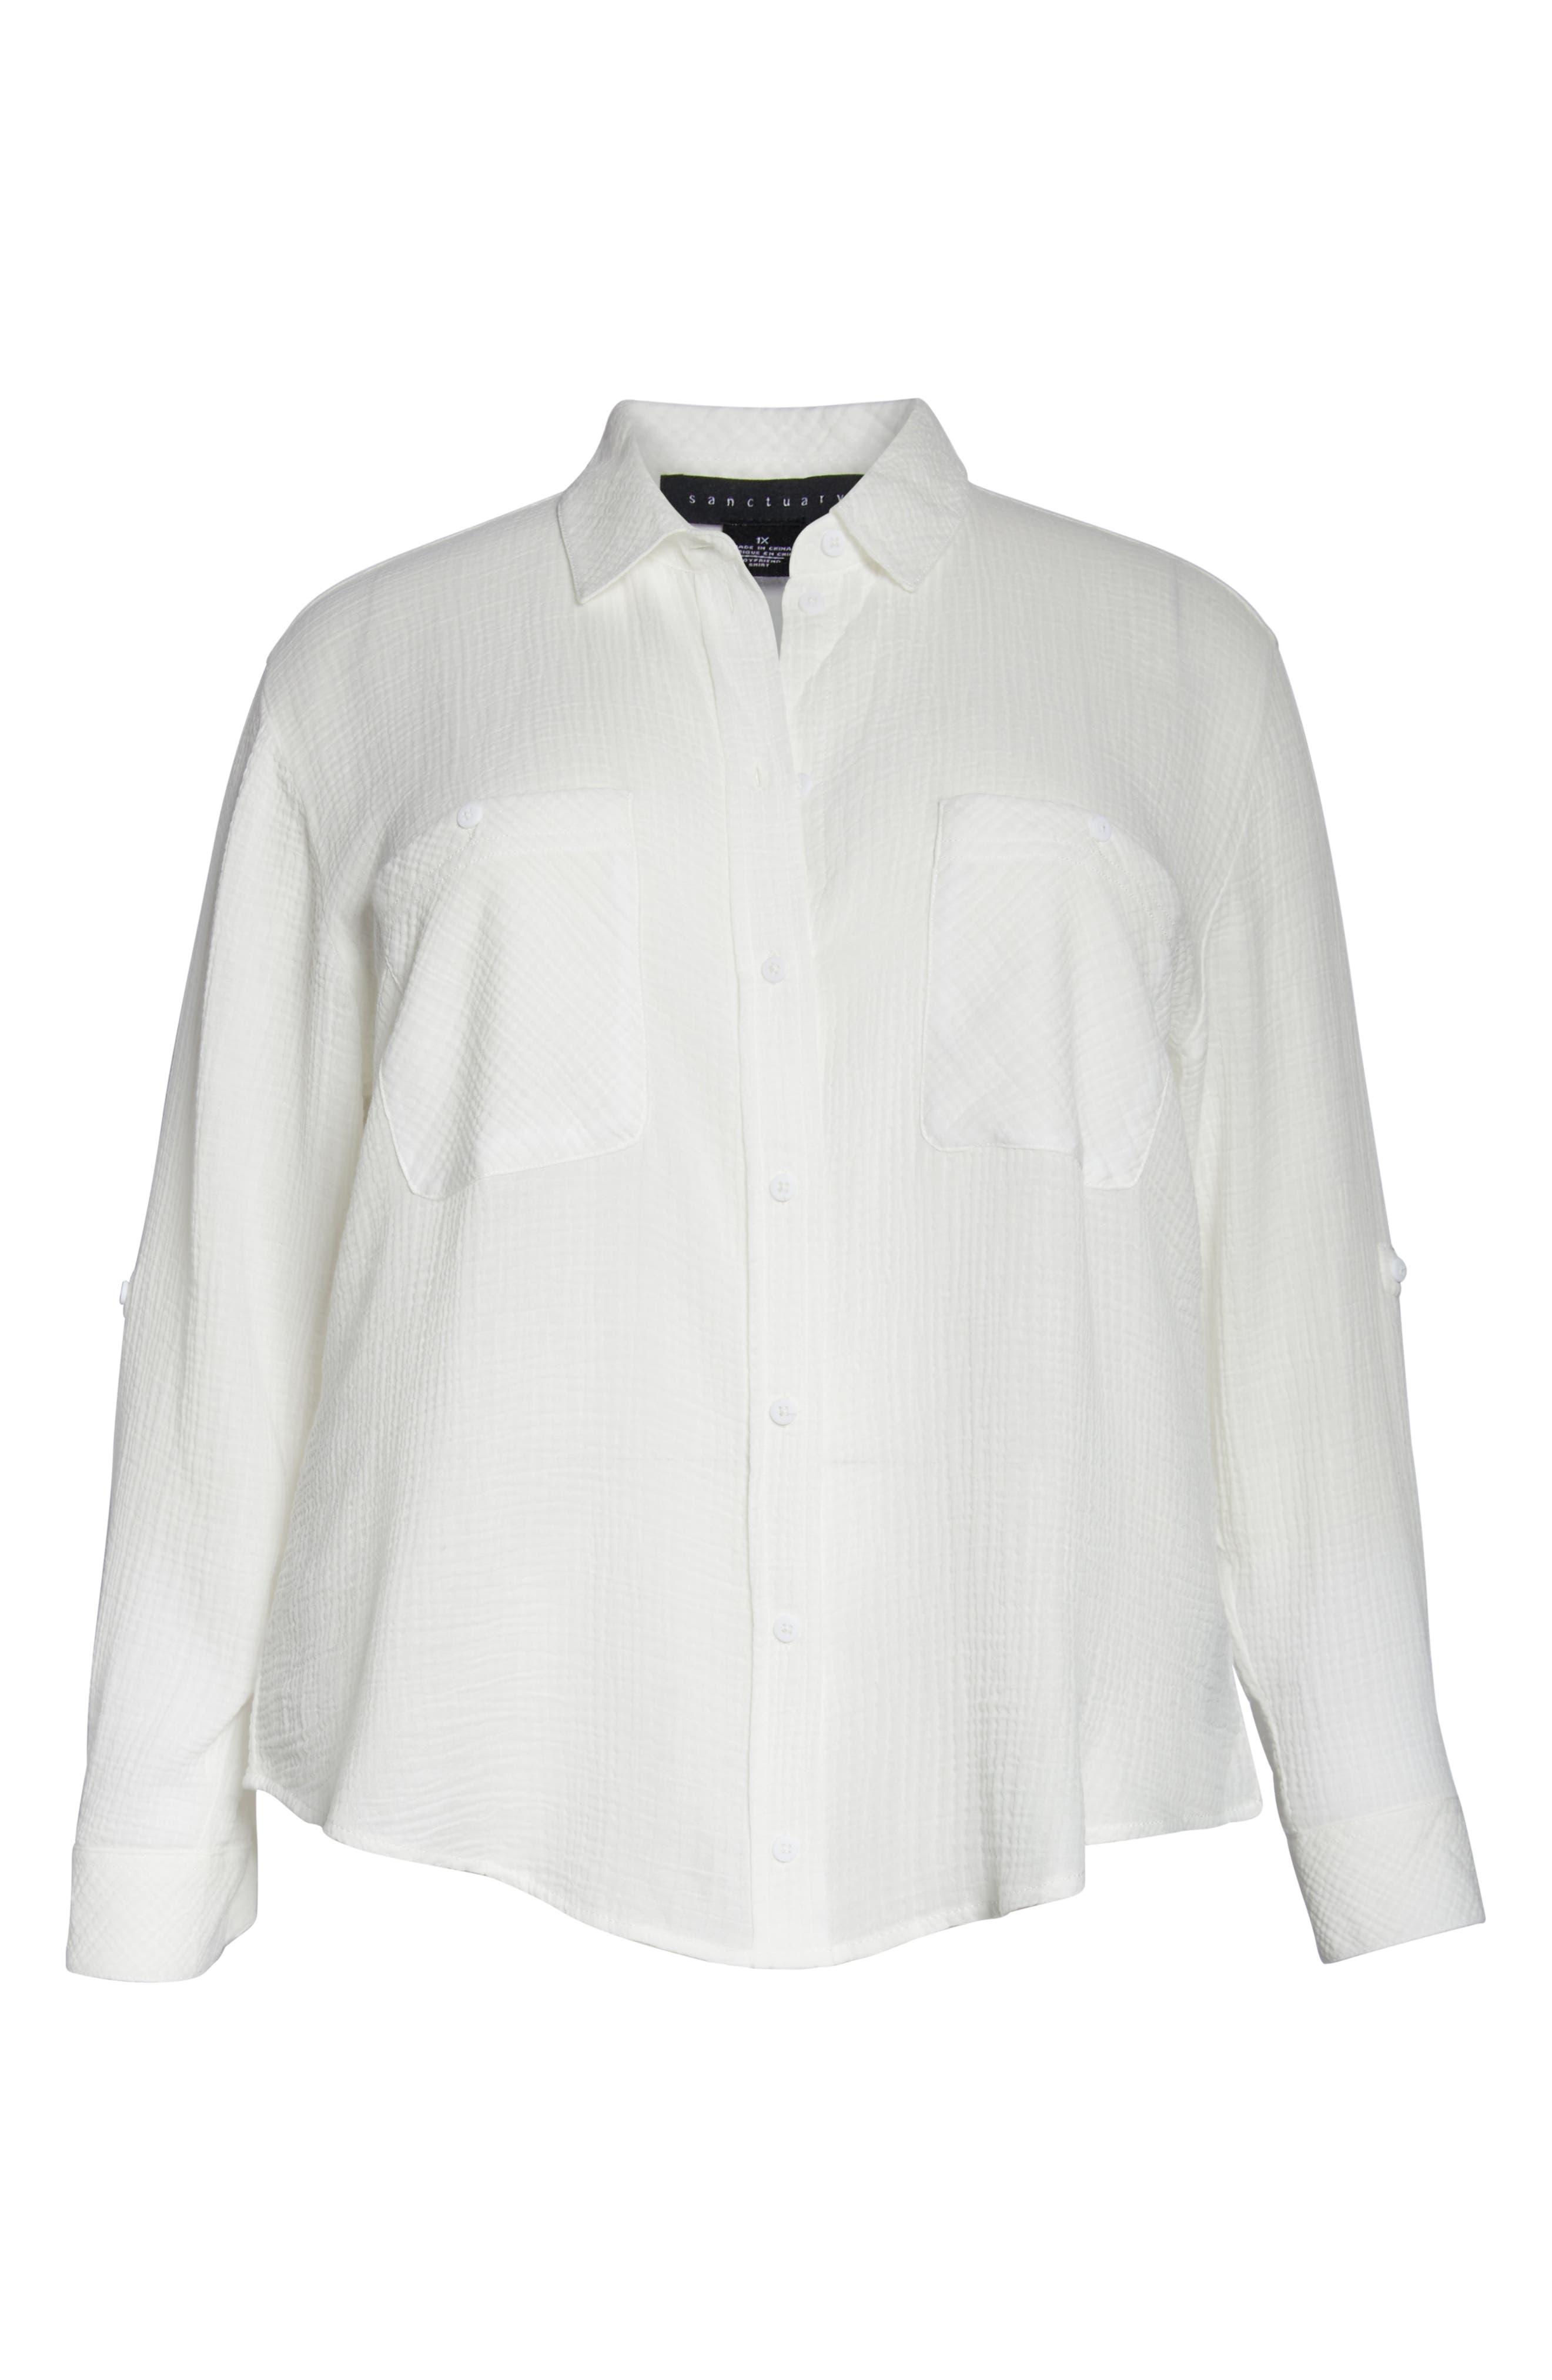 SANCTUARY, Steady Boyfriend Shirt, Alternate thumbnail 3, color, WHITE